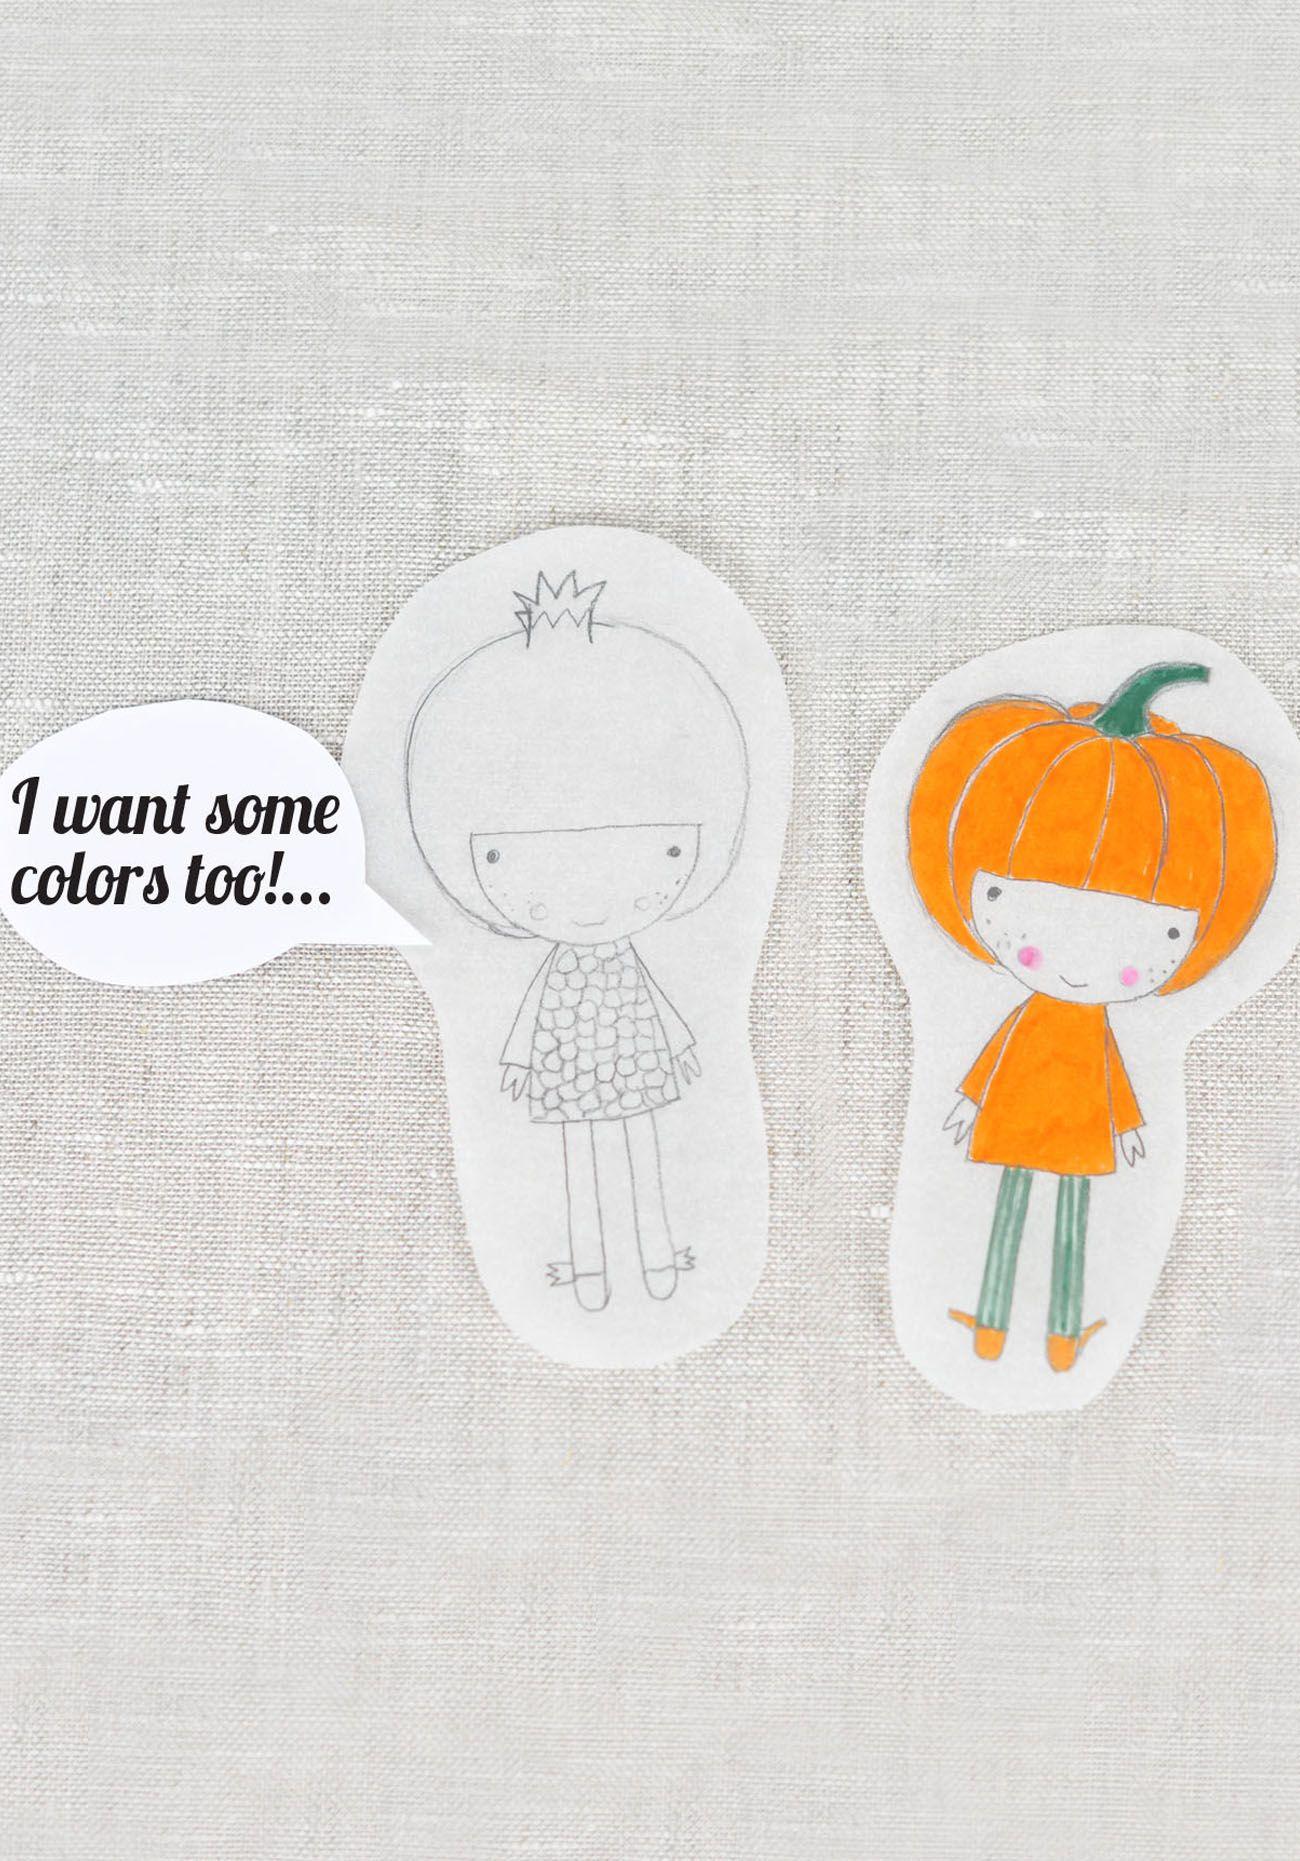 Pomegranate and Pumpkin illustration  - by PinkNounou